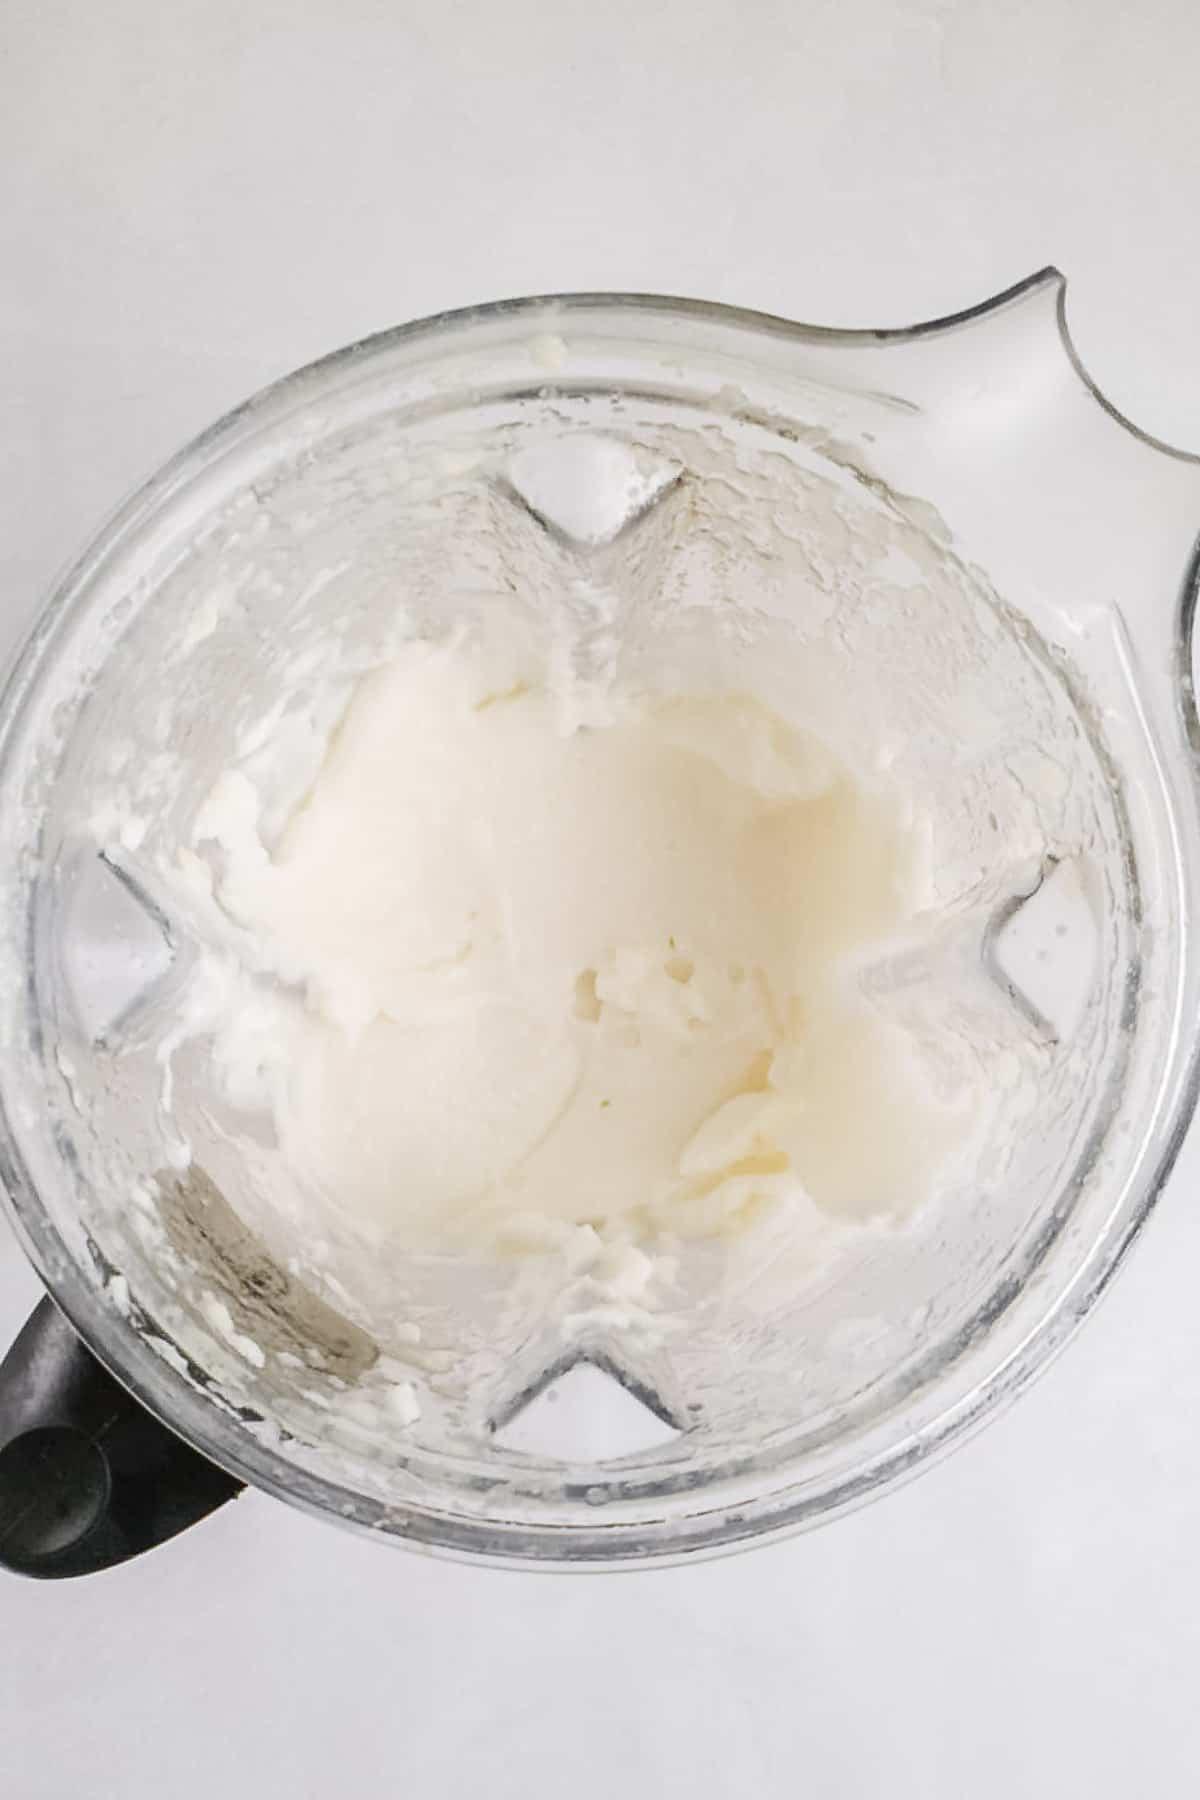 White Spread in a Blender